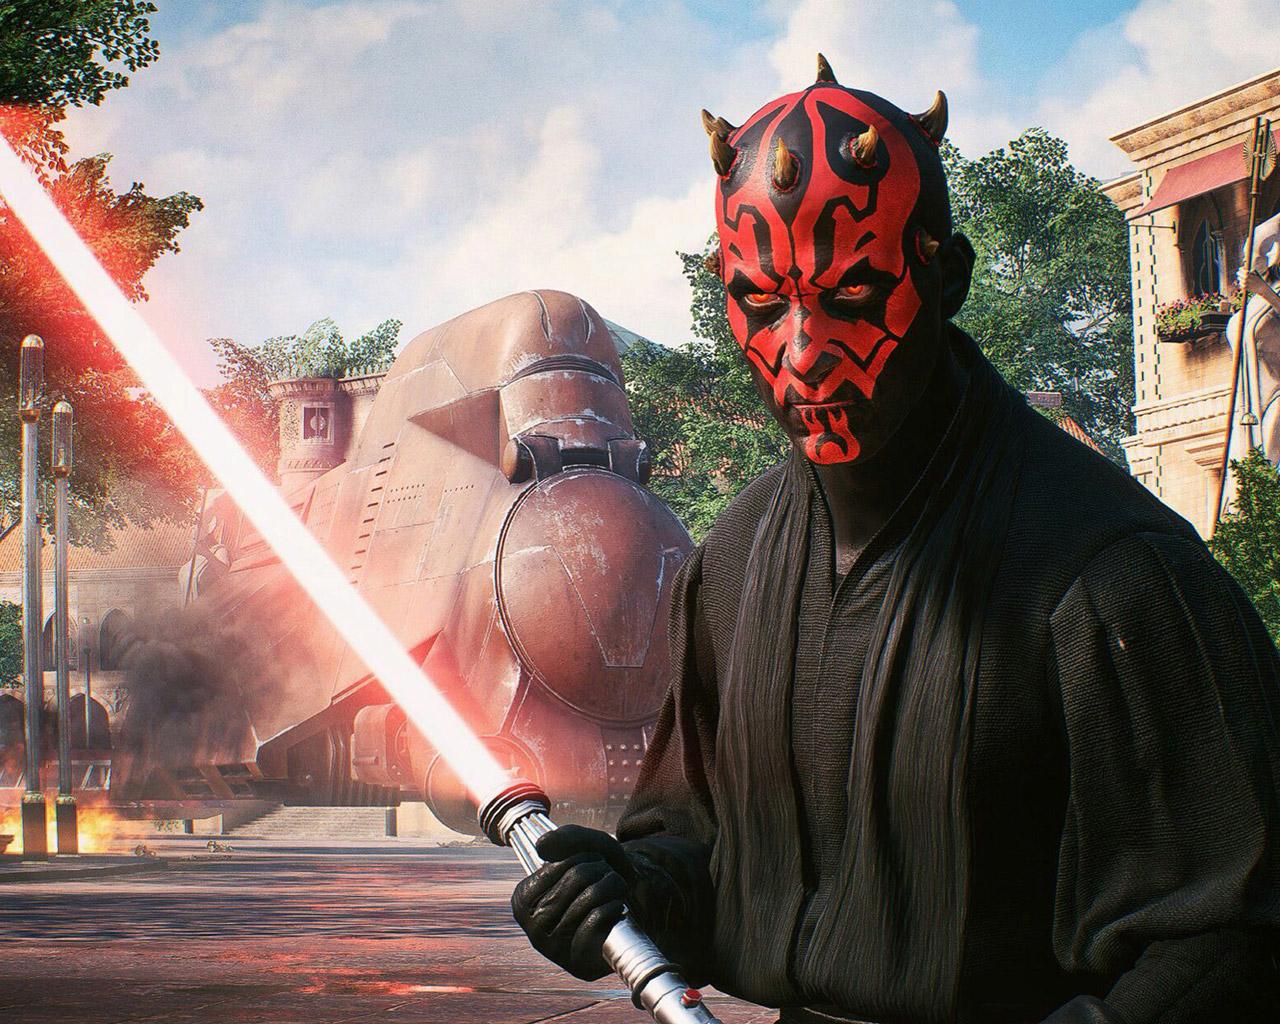 Star Wars: Battlefront II Wallpaper in 1280x1024